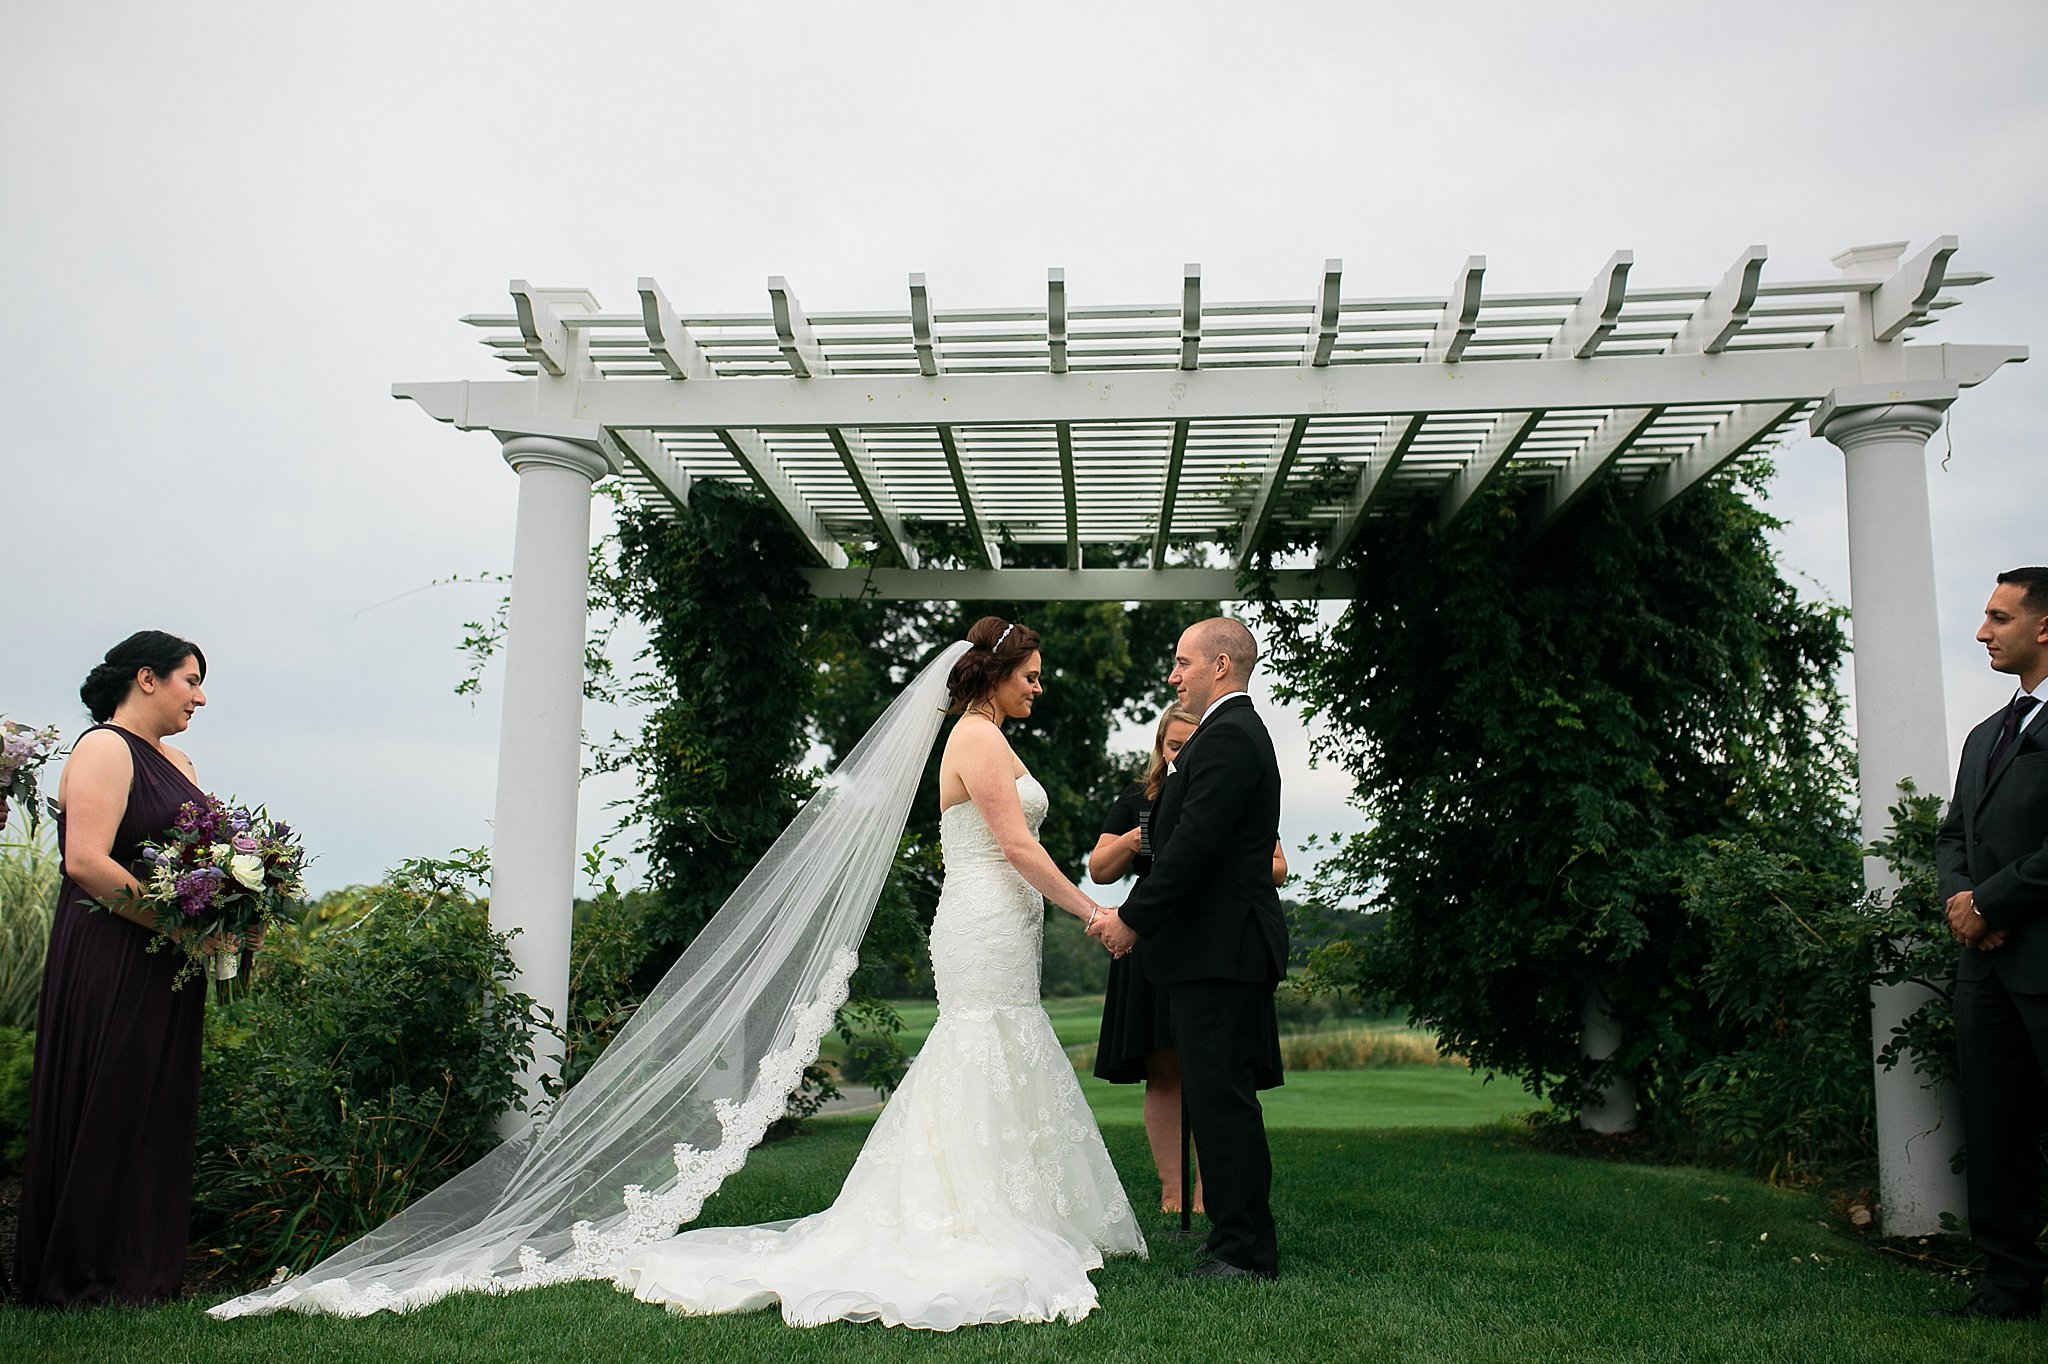 Links at Unionvale Wedding Lagrangeville Wedding Hudson Valley Wedding Photographer Sweet Alice Photography35.jpg